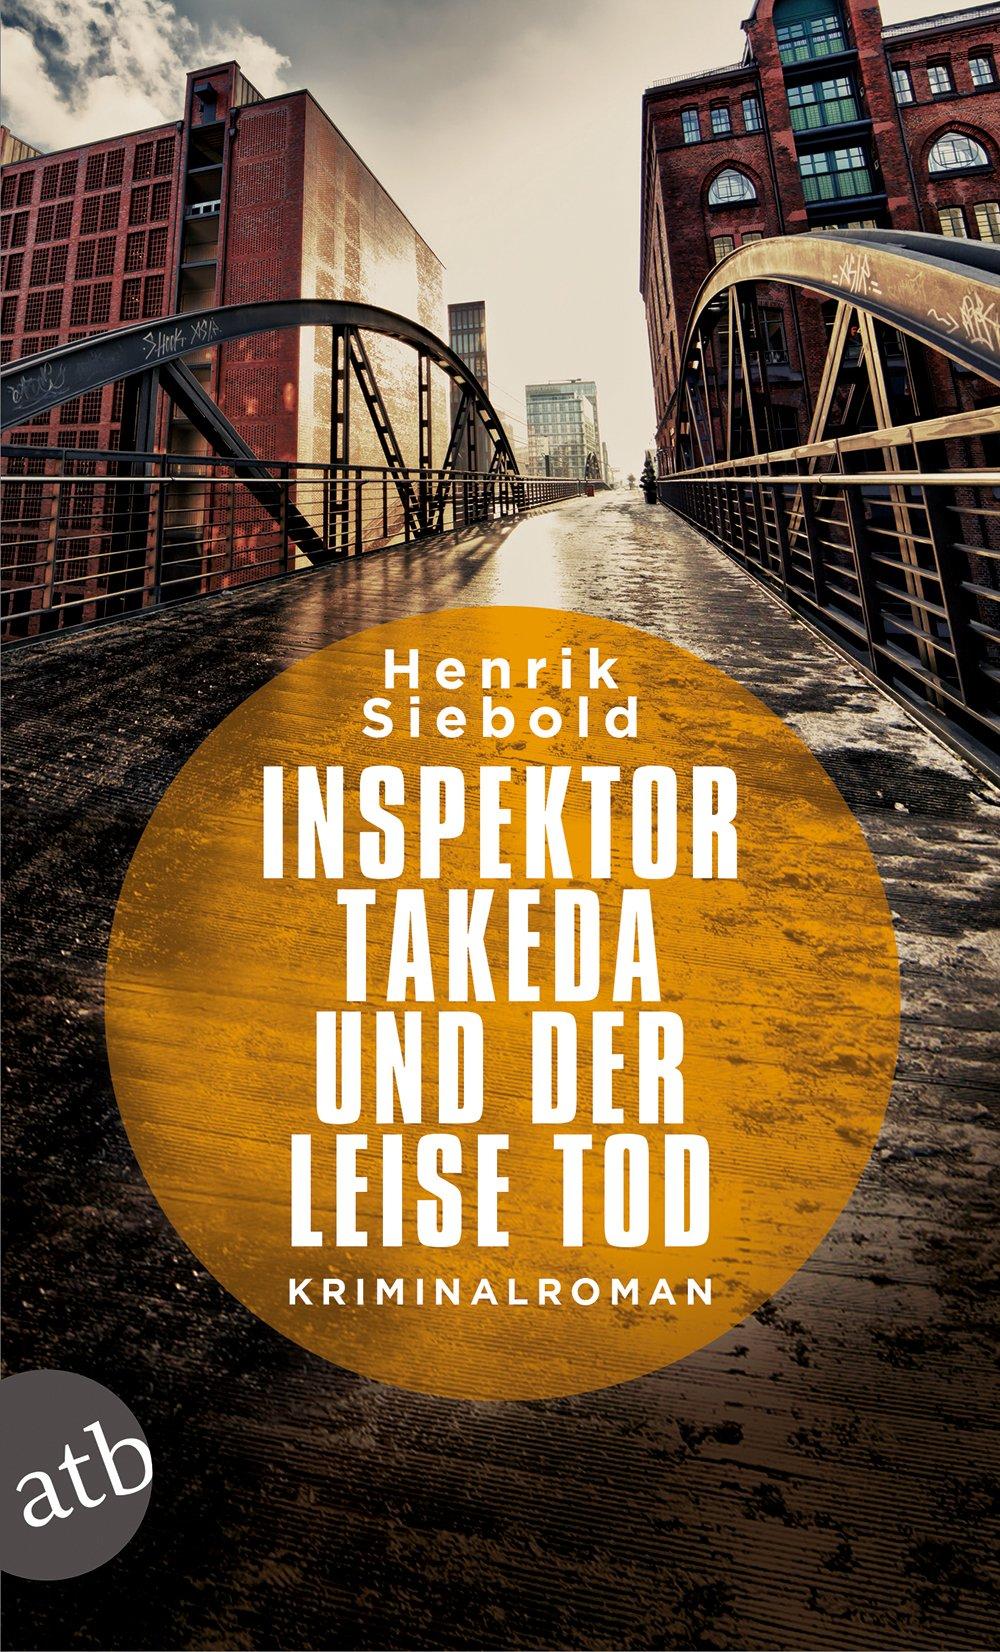 Inspektor Takeda und der leise Tod: Kriminalroman (Inspektor Takeda ermittelt, Band 2)